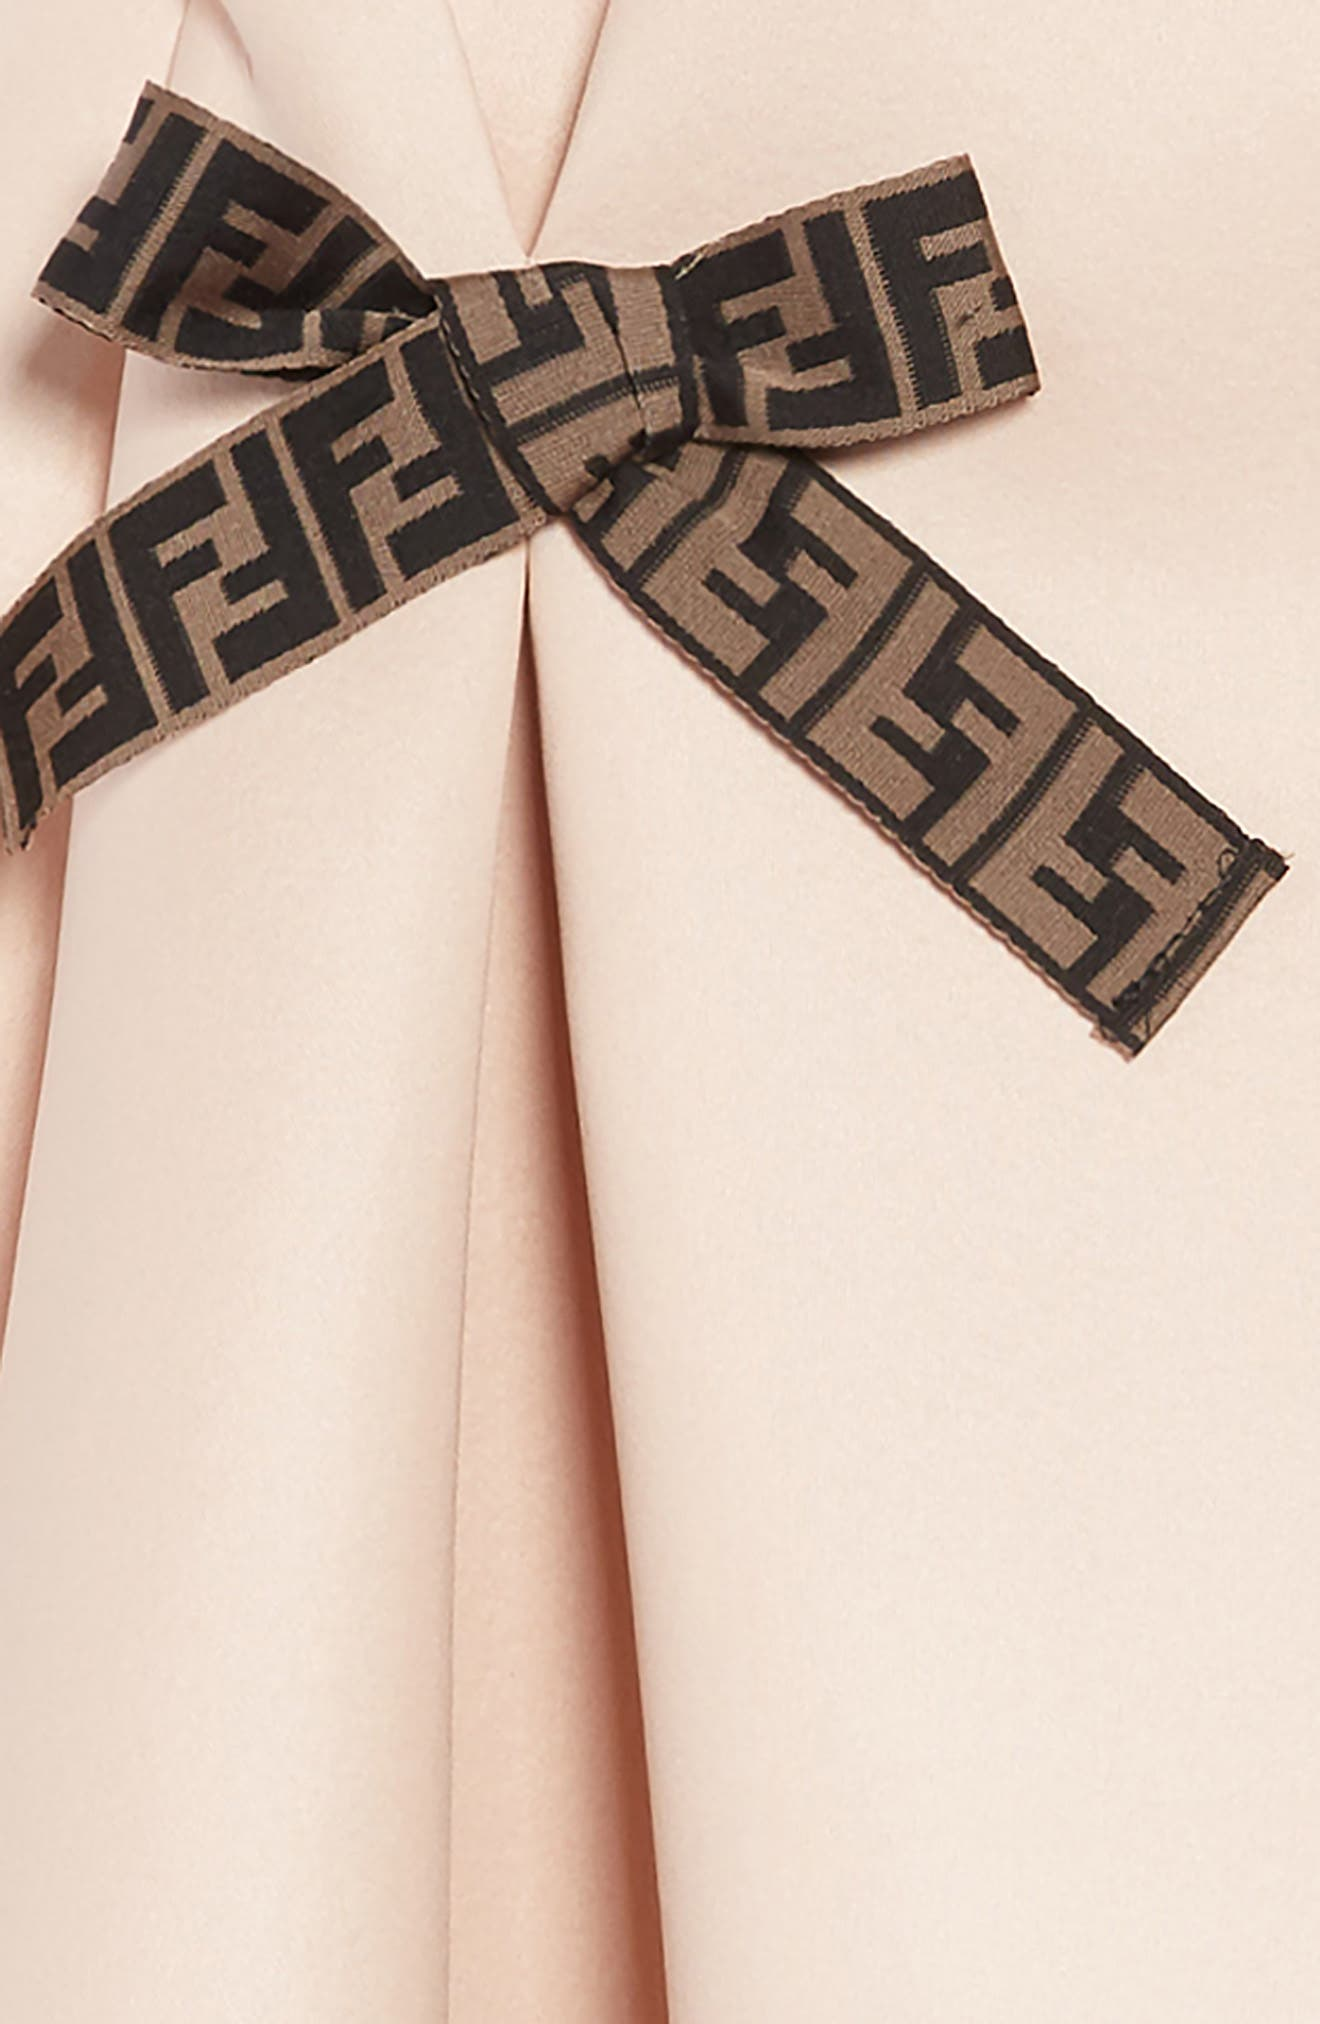 FENDI, Bow Detail Dress, Alternate thumbnail 3, color, F0JE6 PEACH